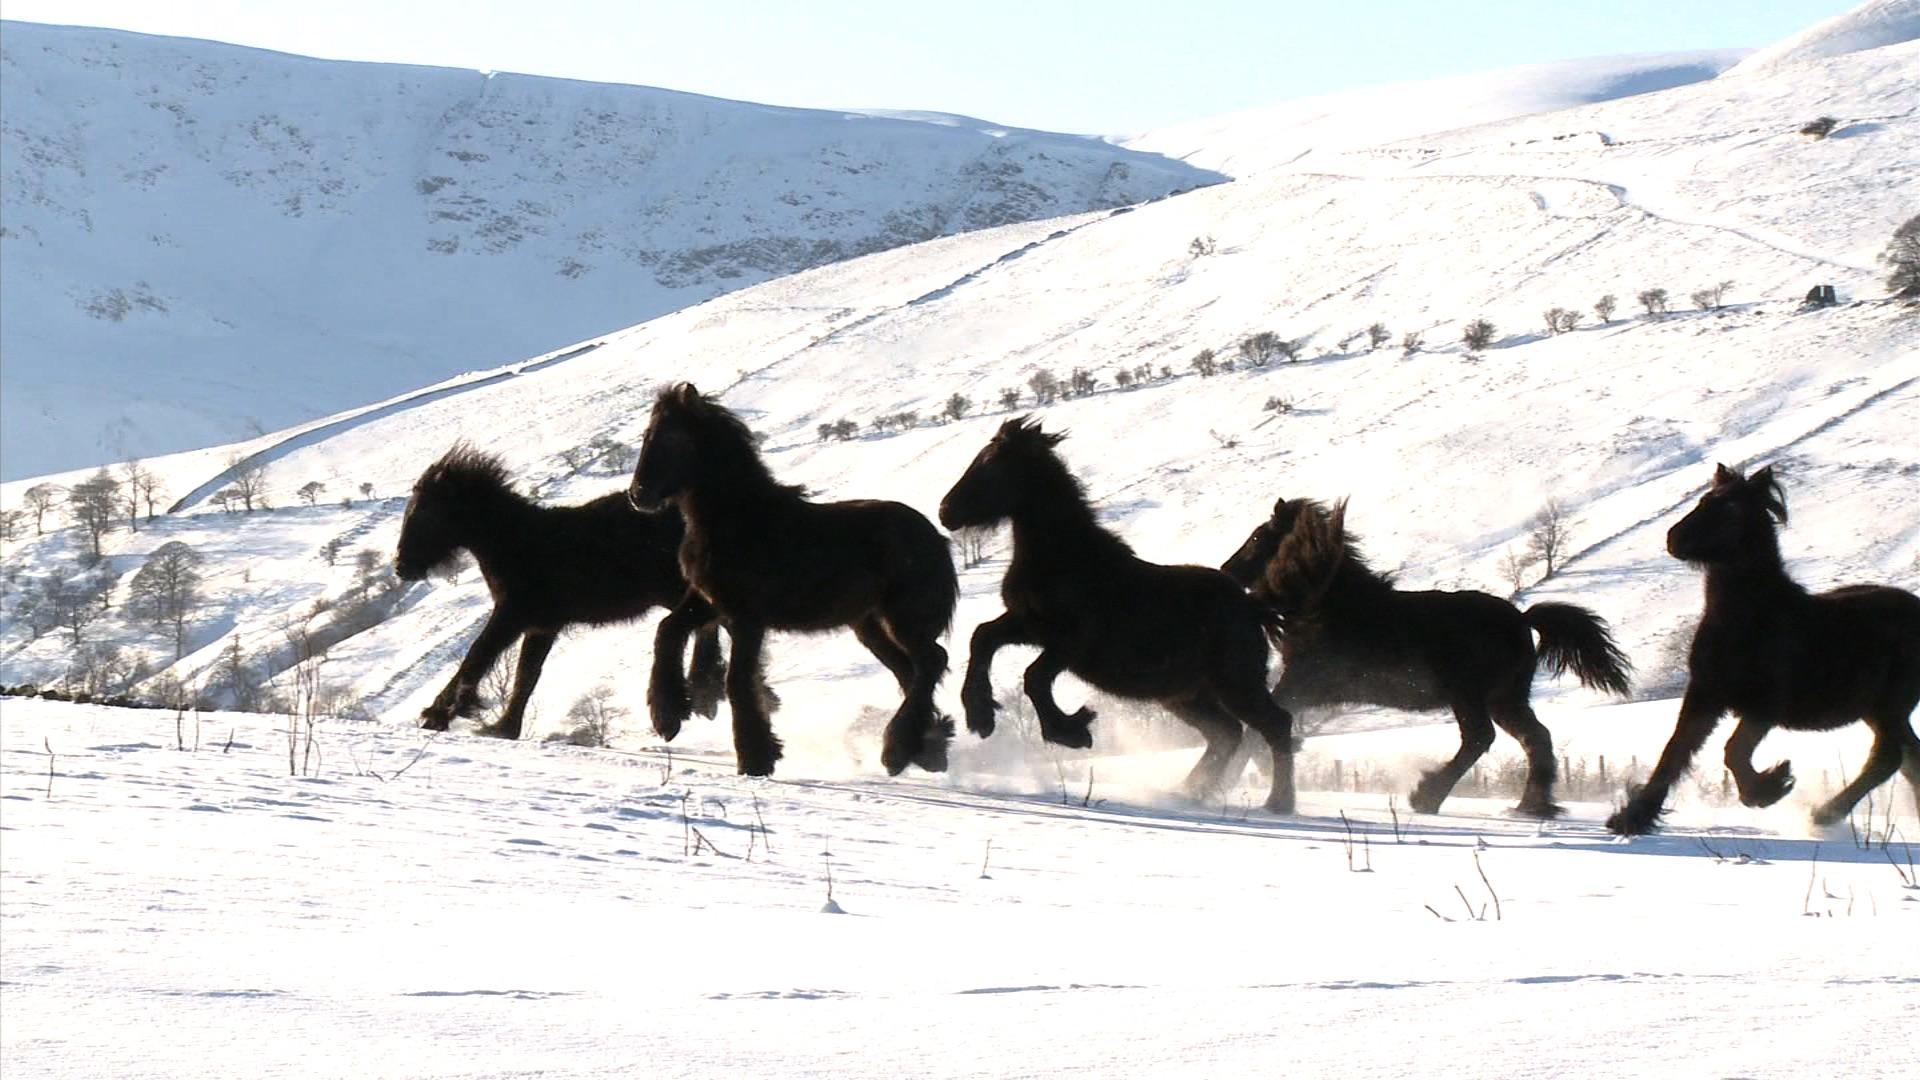 Murthwaite foals, Howgill Fells